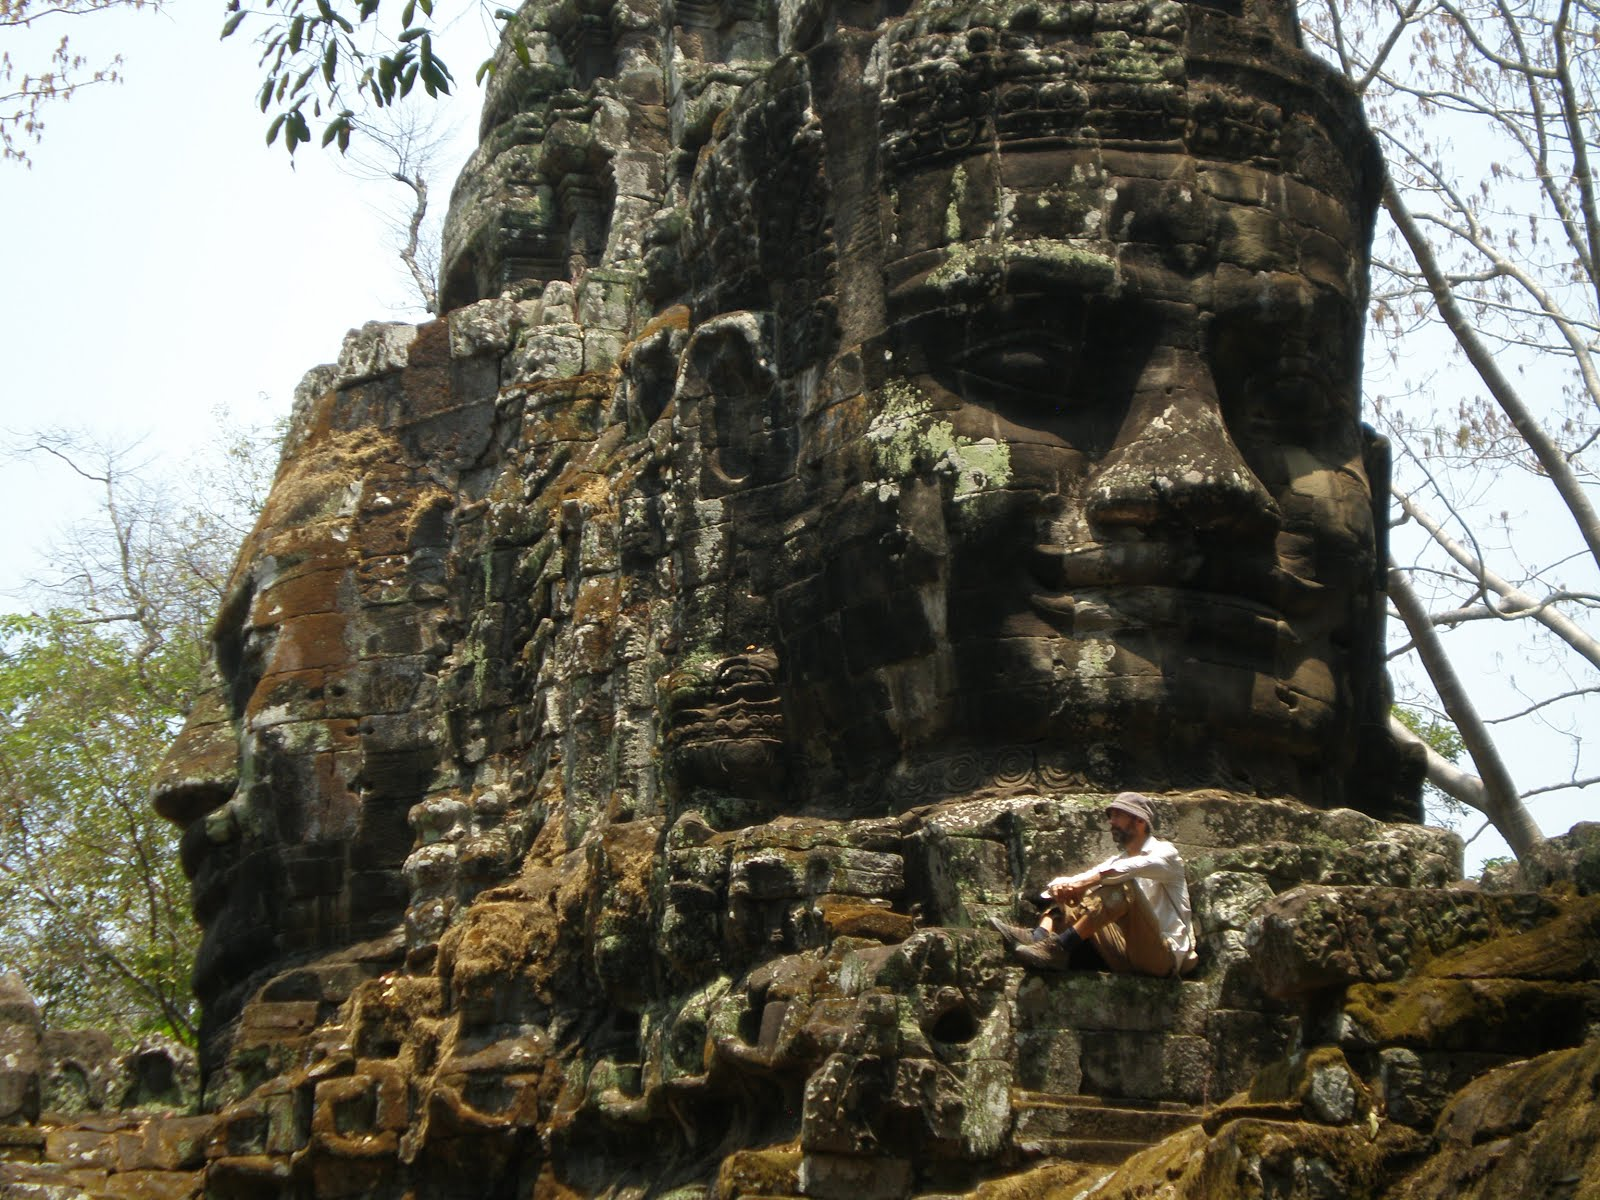 2015, Angkor (Camboya)